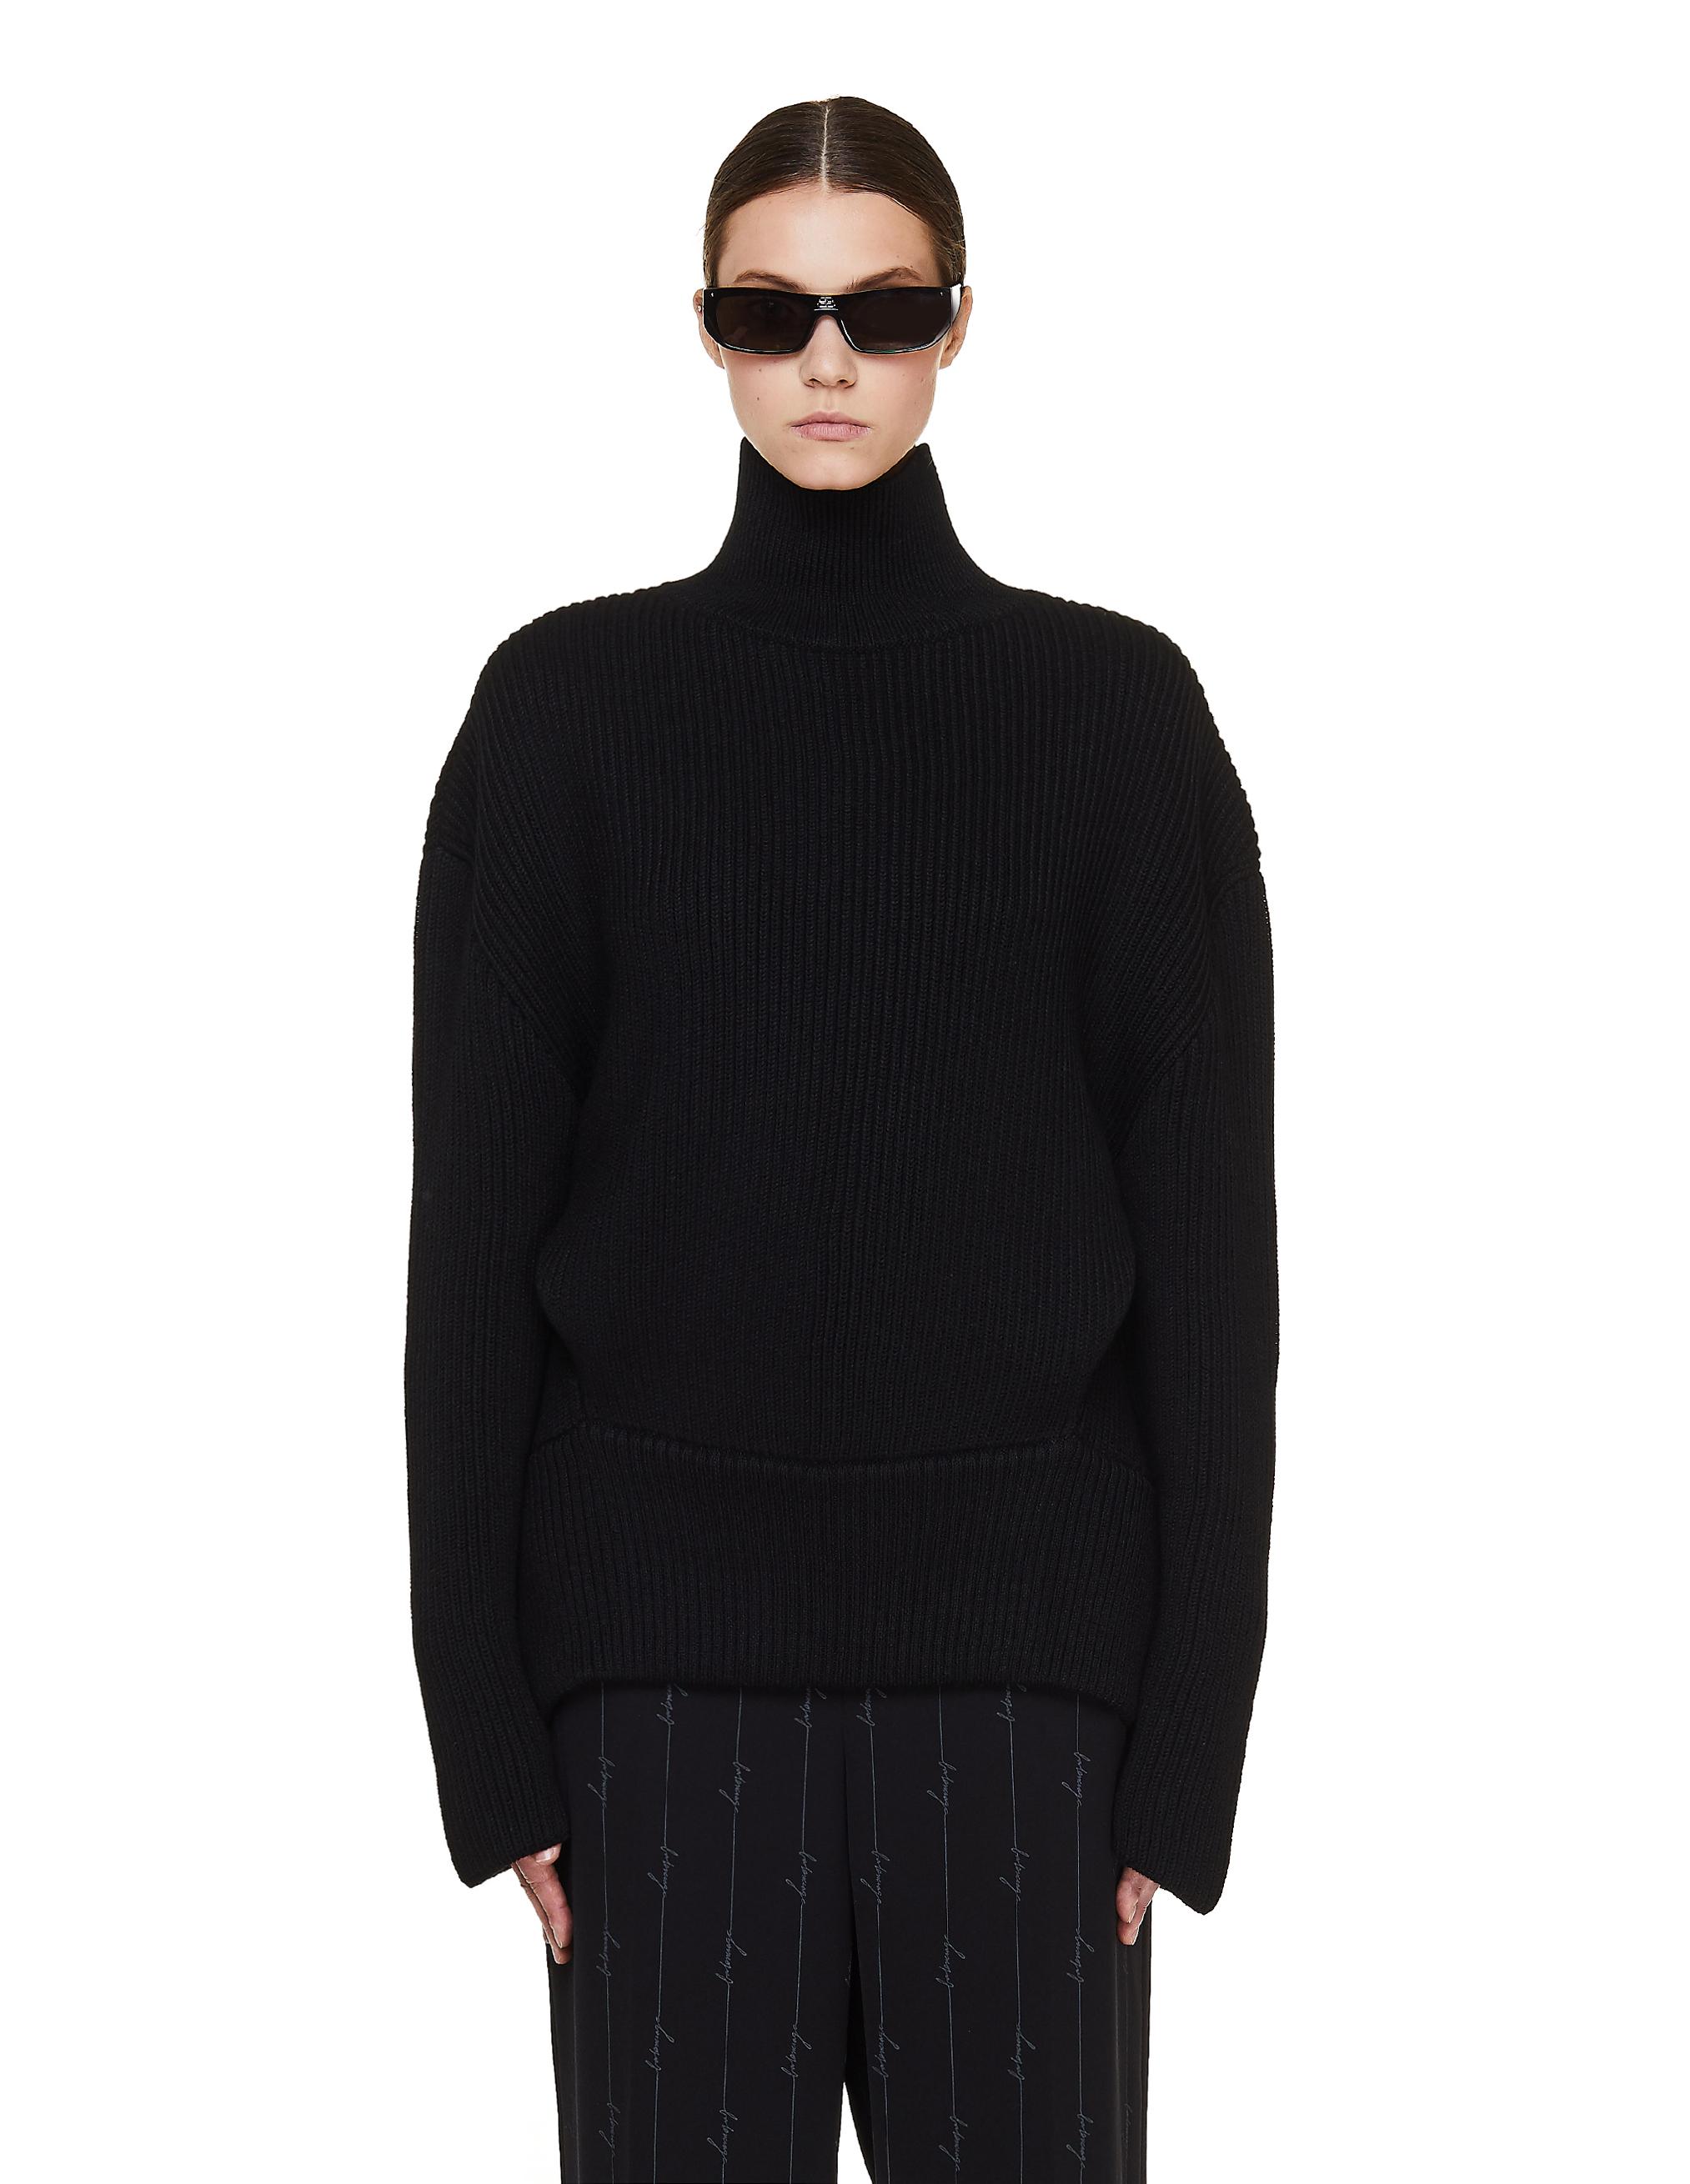 Balenciaga Black Wool Upside Down Sweater